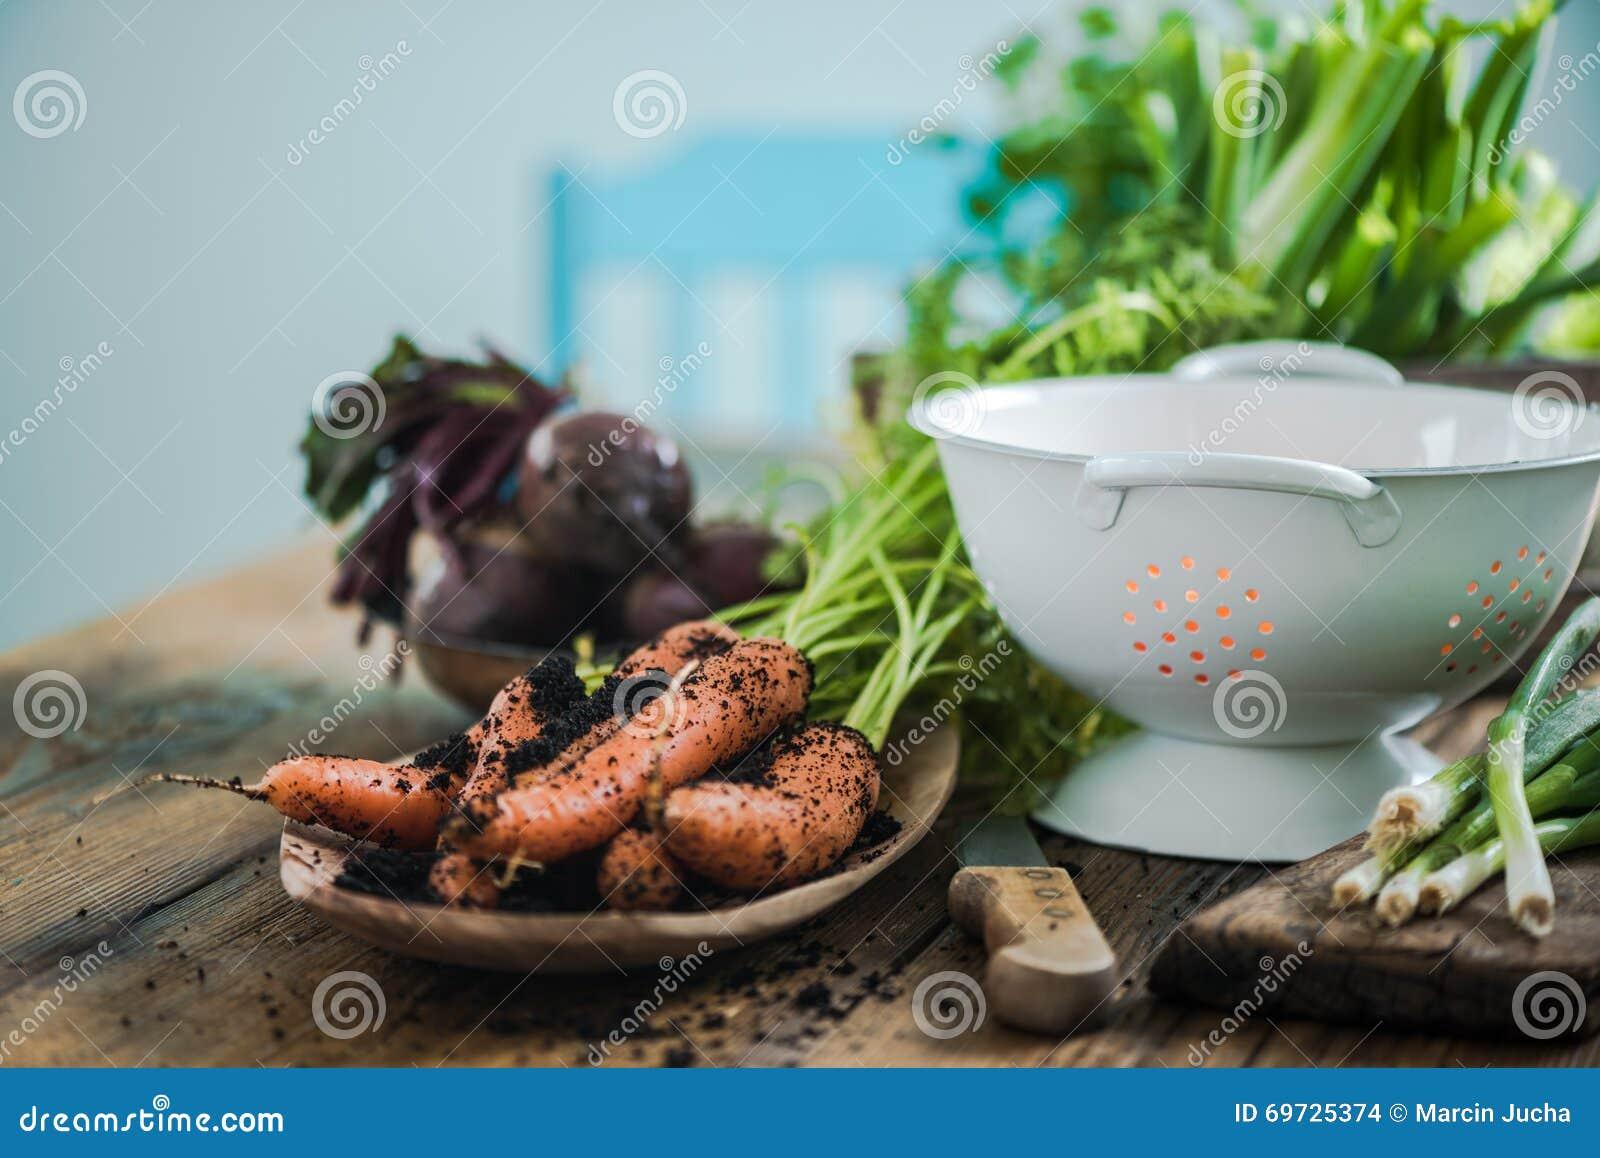 Healthy Food Delivery Homestead